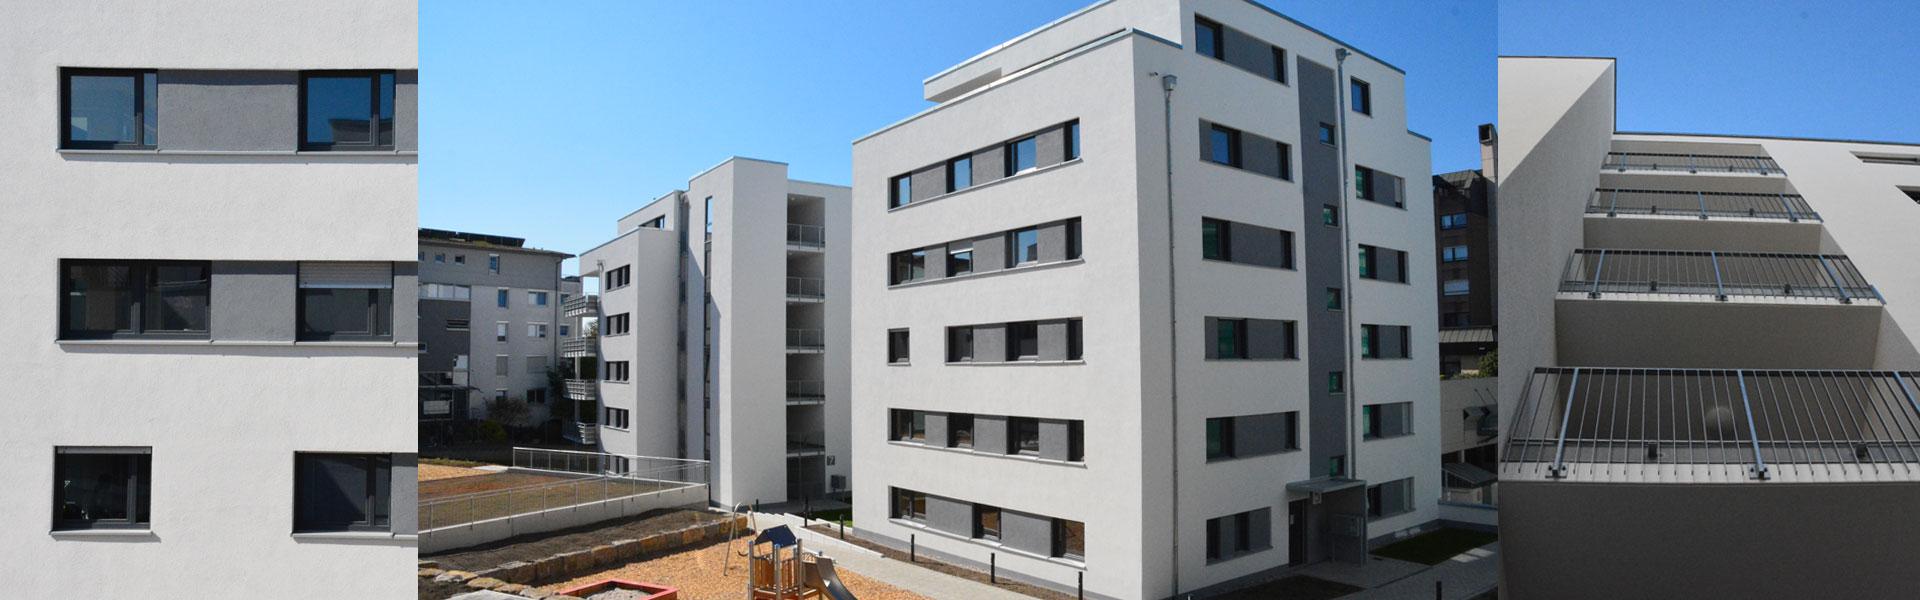 gb-architekten-slider-bahnhofstrasse2